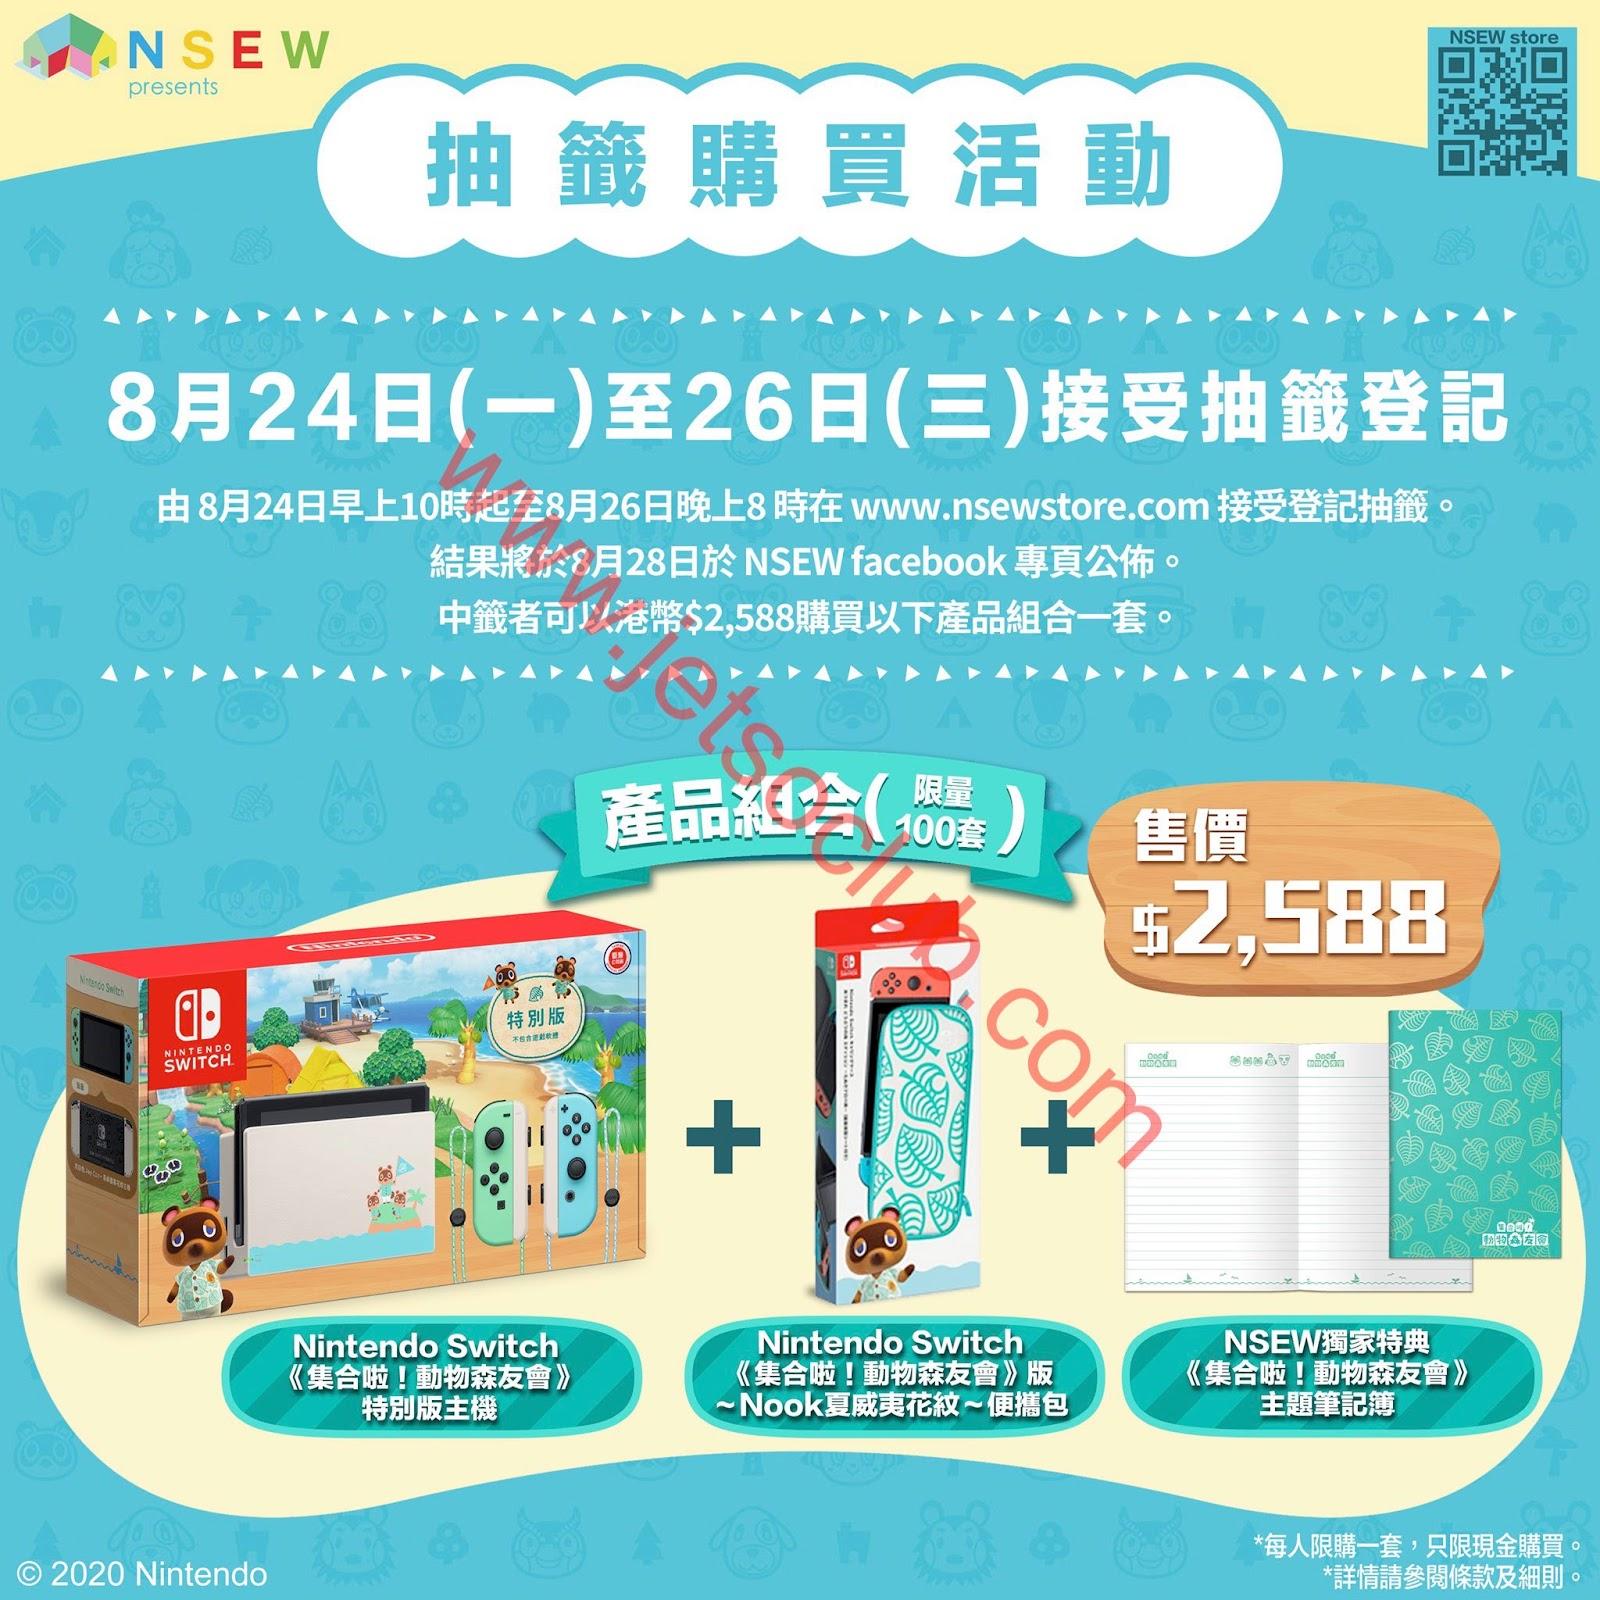 NSEW 任天堂正規商品販賣店:Nintendo Switch《集合啦!動物森友會》特別版主機組合 抽籤購買(24-26/8) ( Jetso Club ...